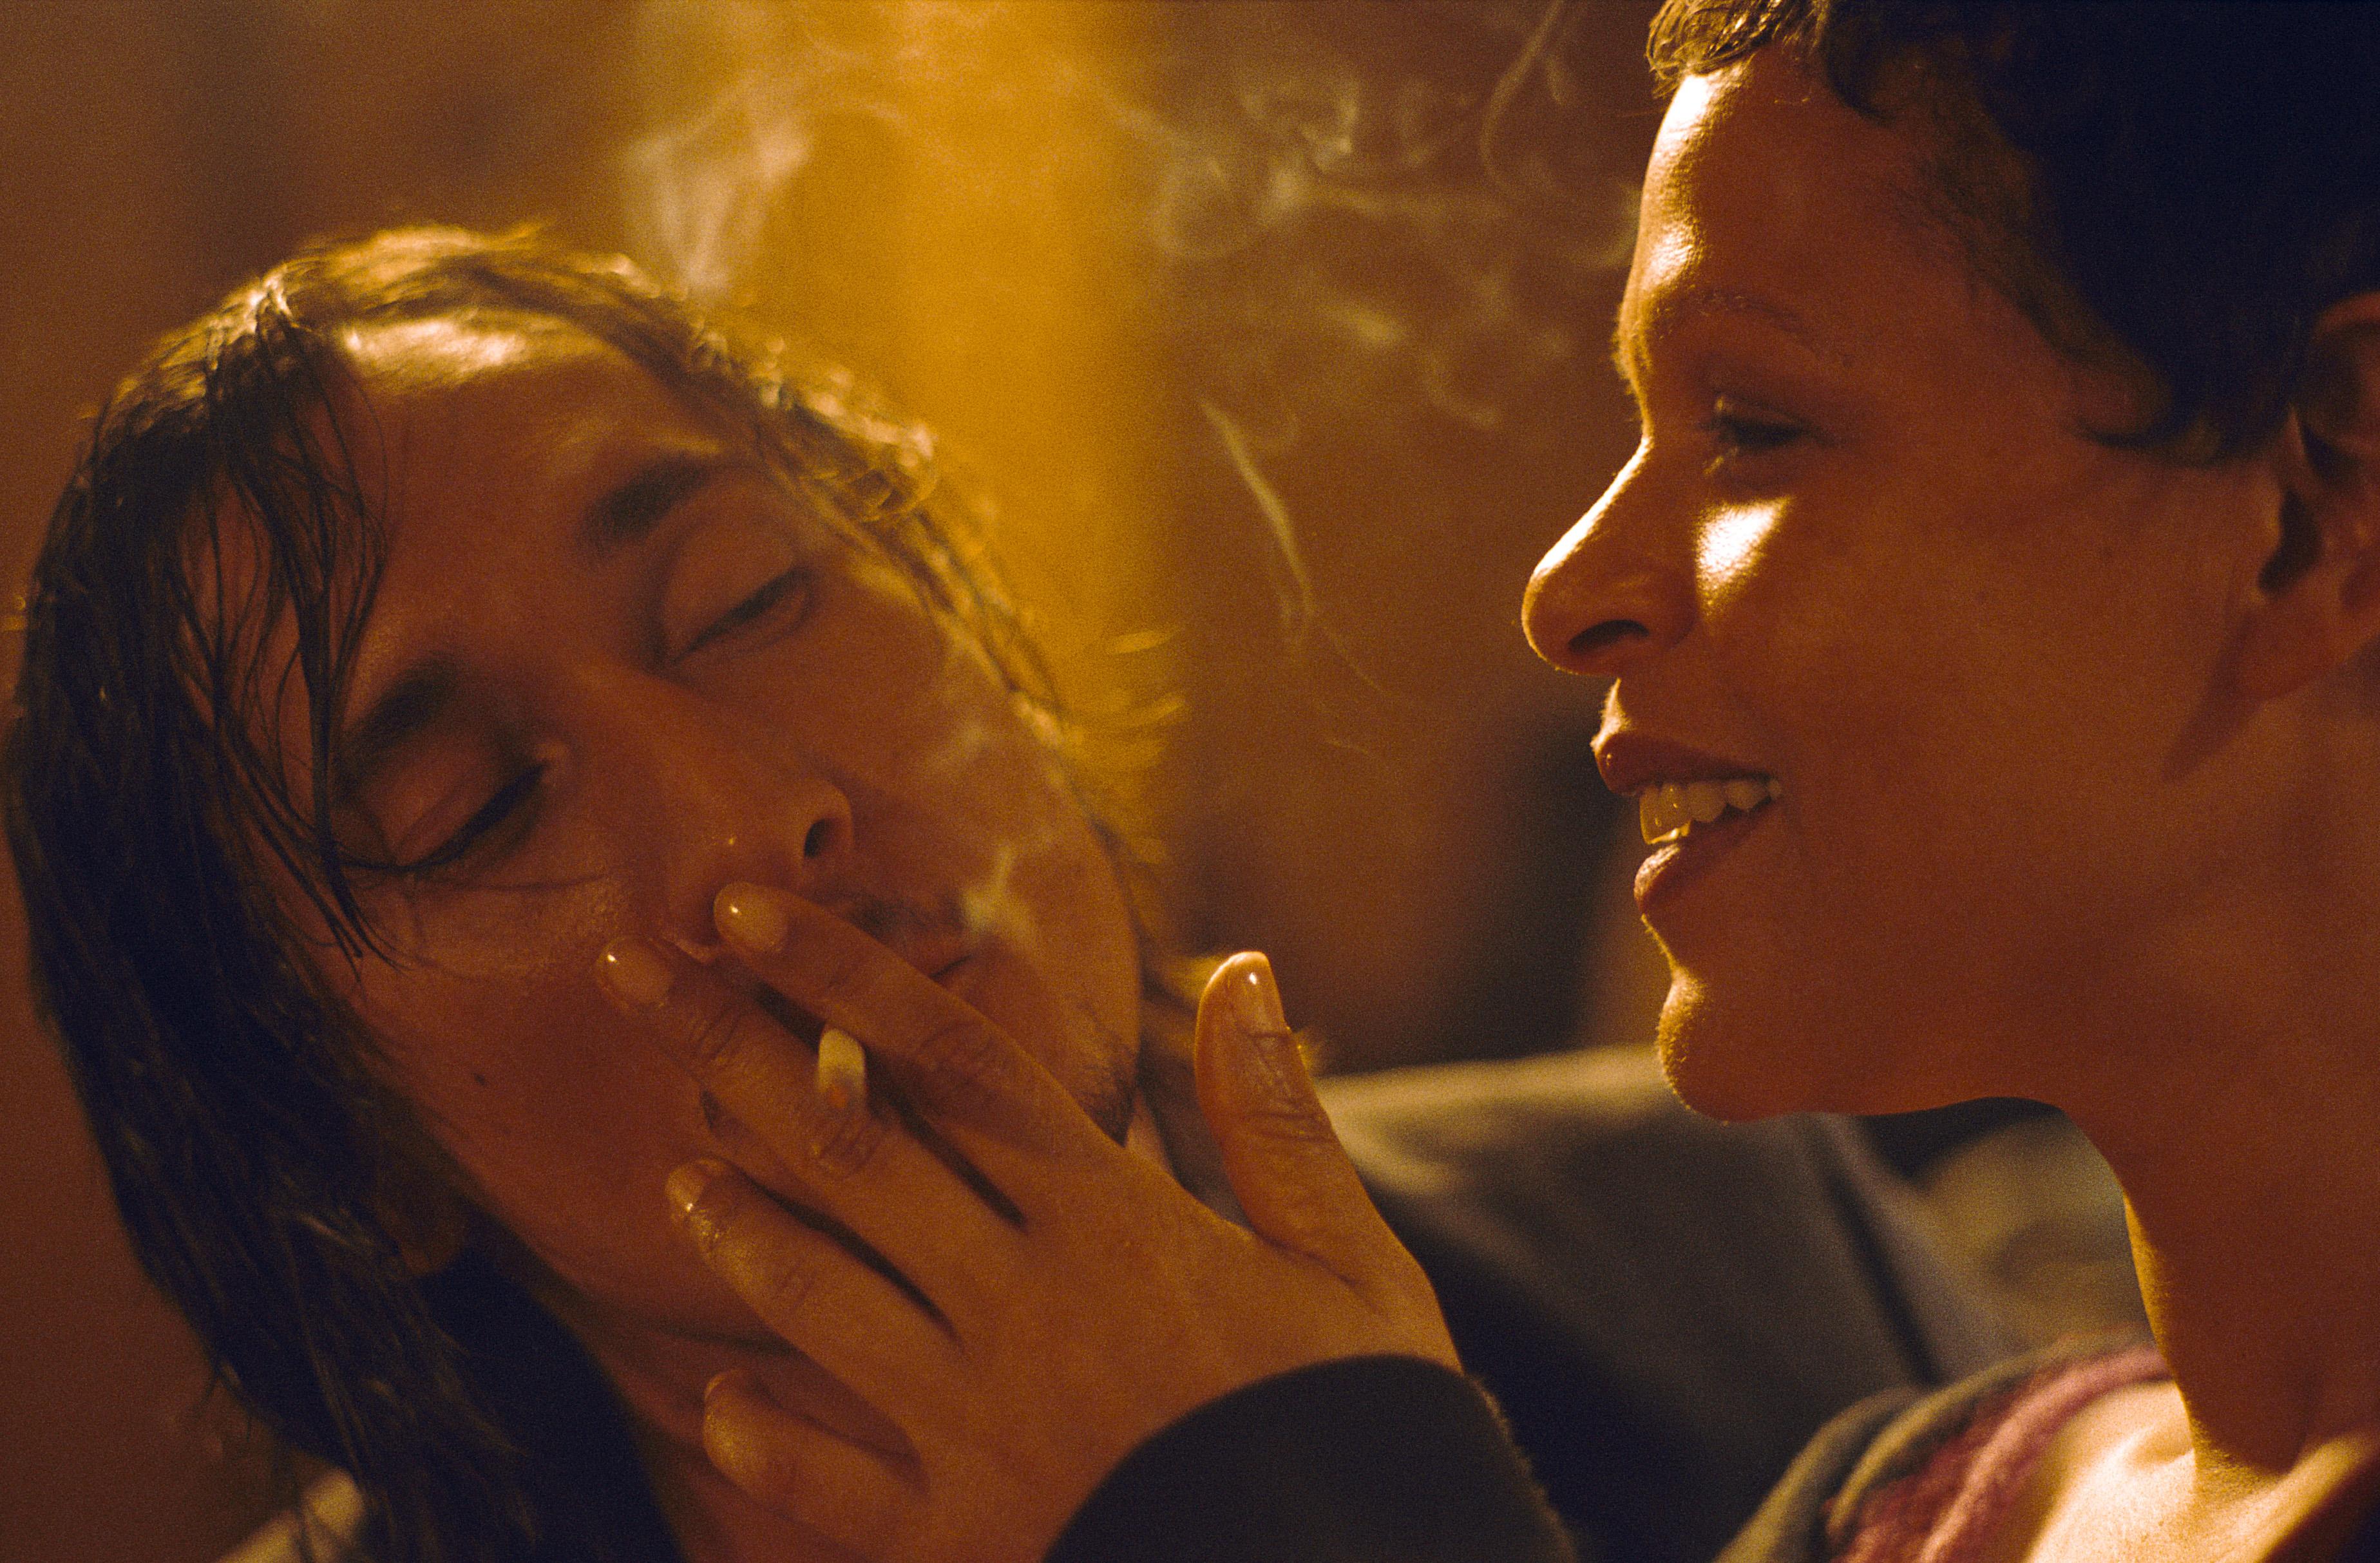 flirting moves that work eye gaze free movies list online